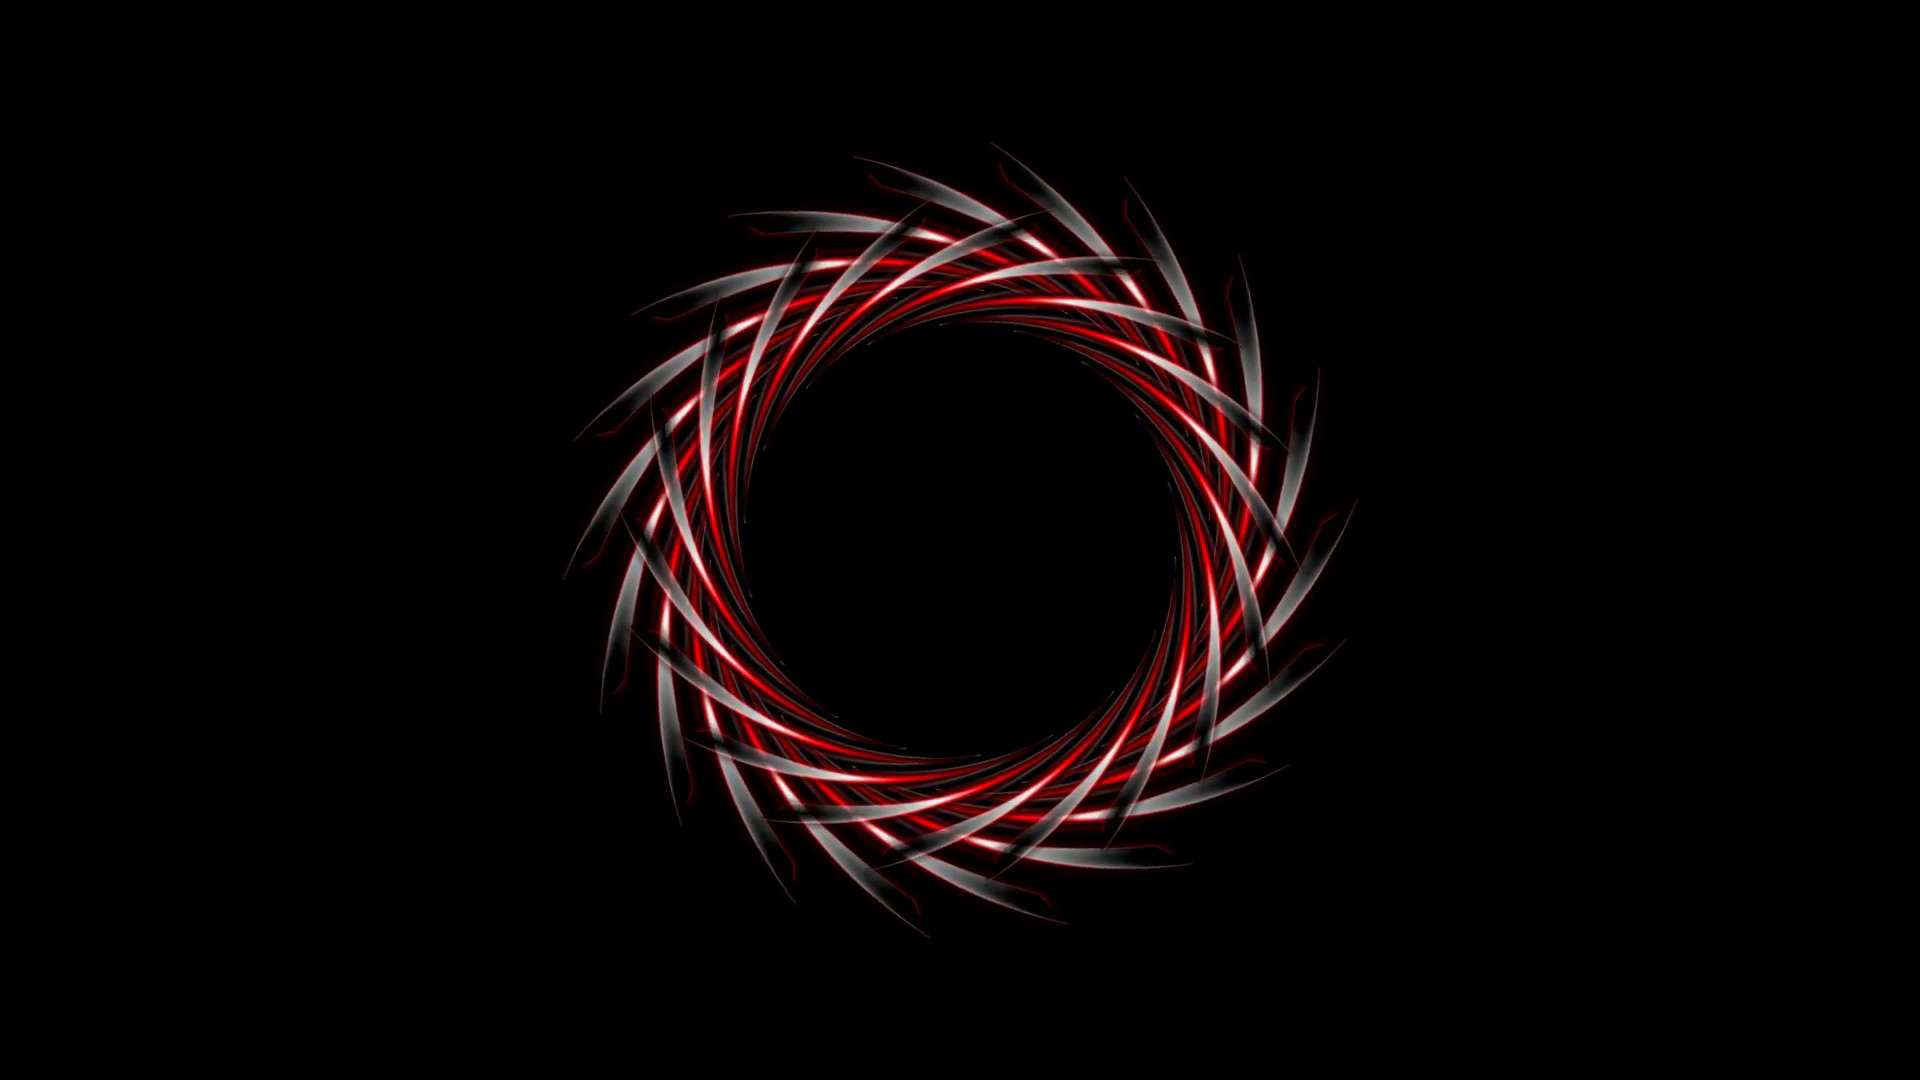 Abstract dark red logo design on black background. Video animation HD  Motion Background – VideoBlocks